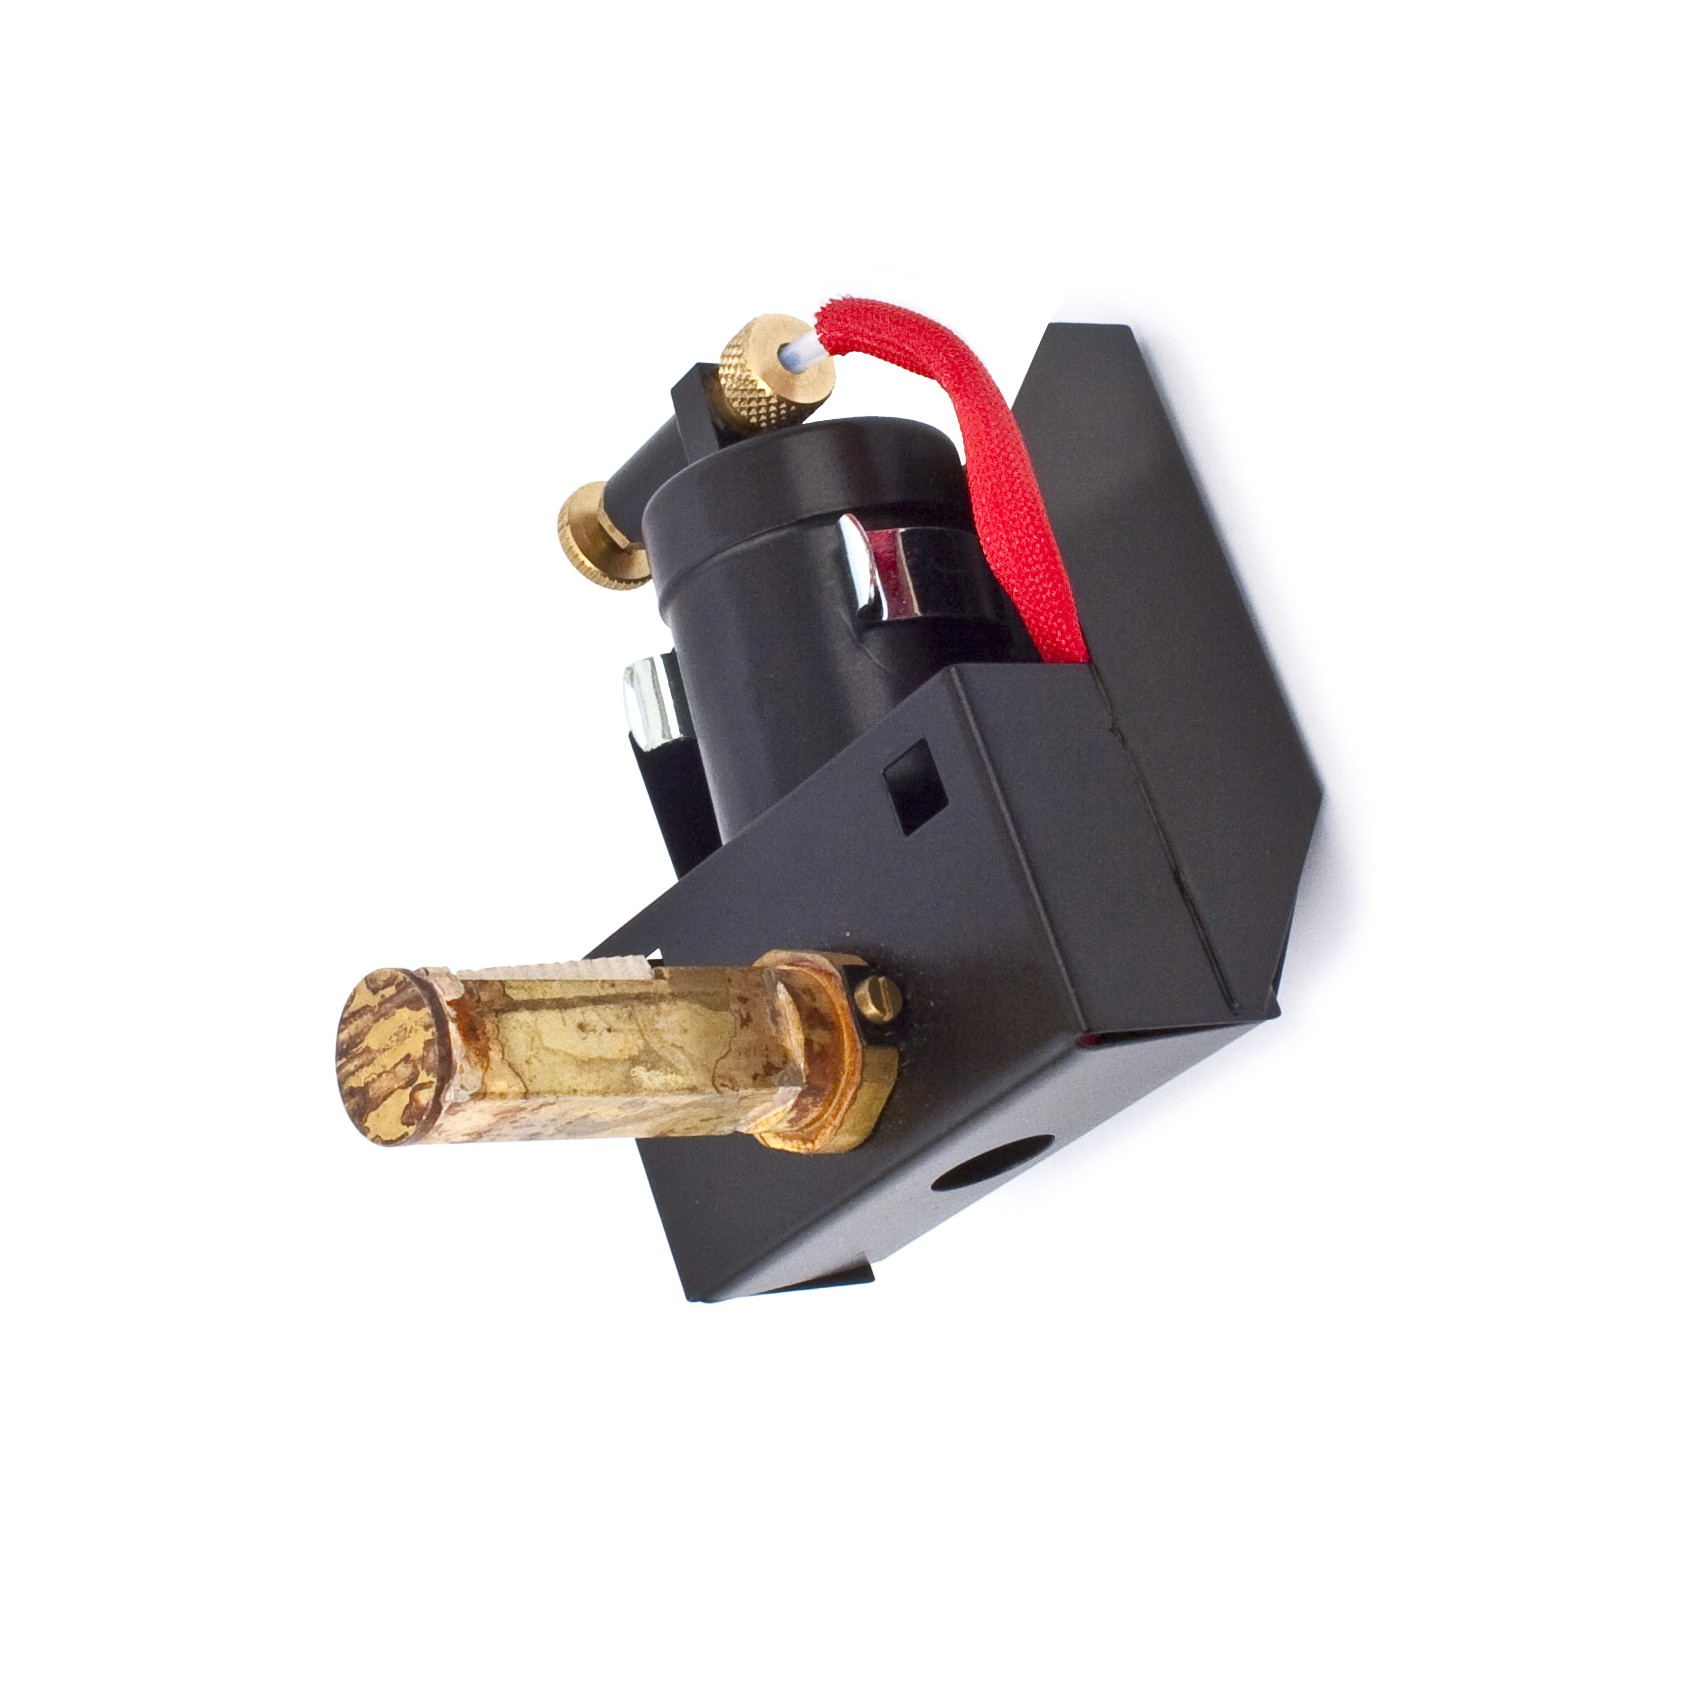 Mamod Live Steam Engines - Mamod Gas Burner Conversion c/w Scuttle